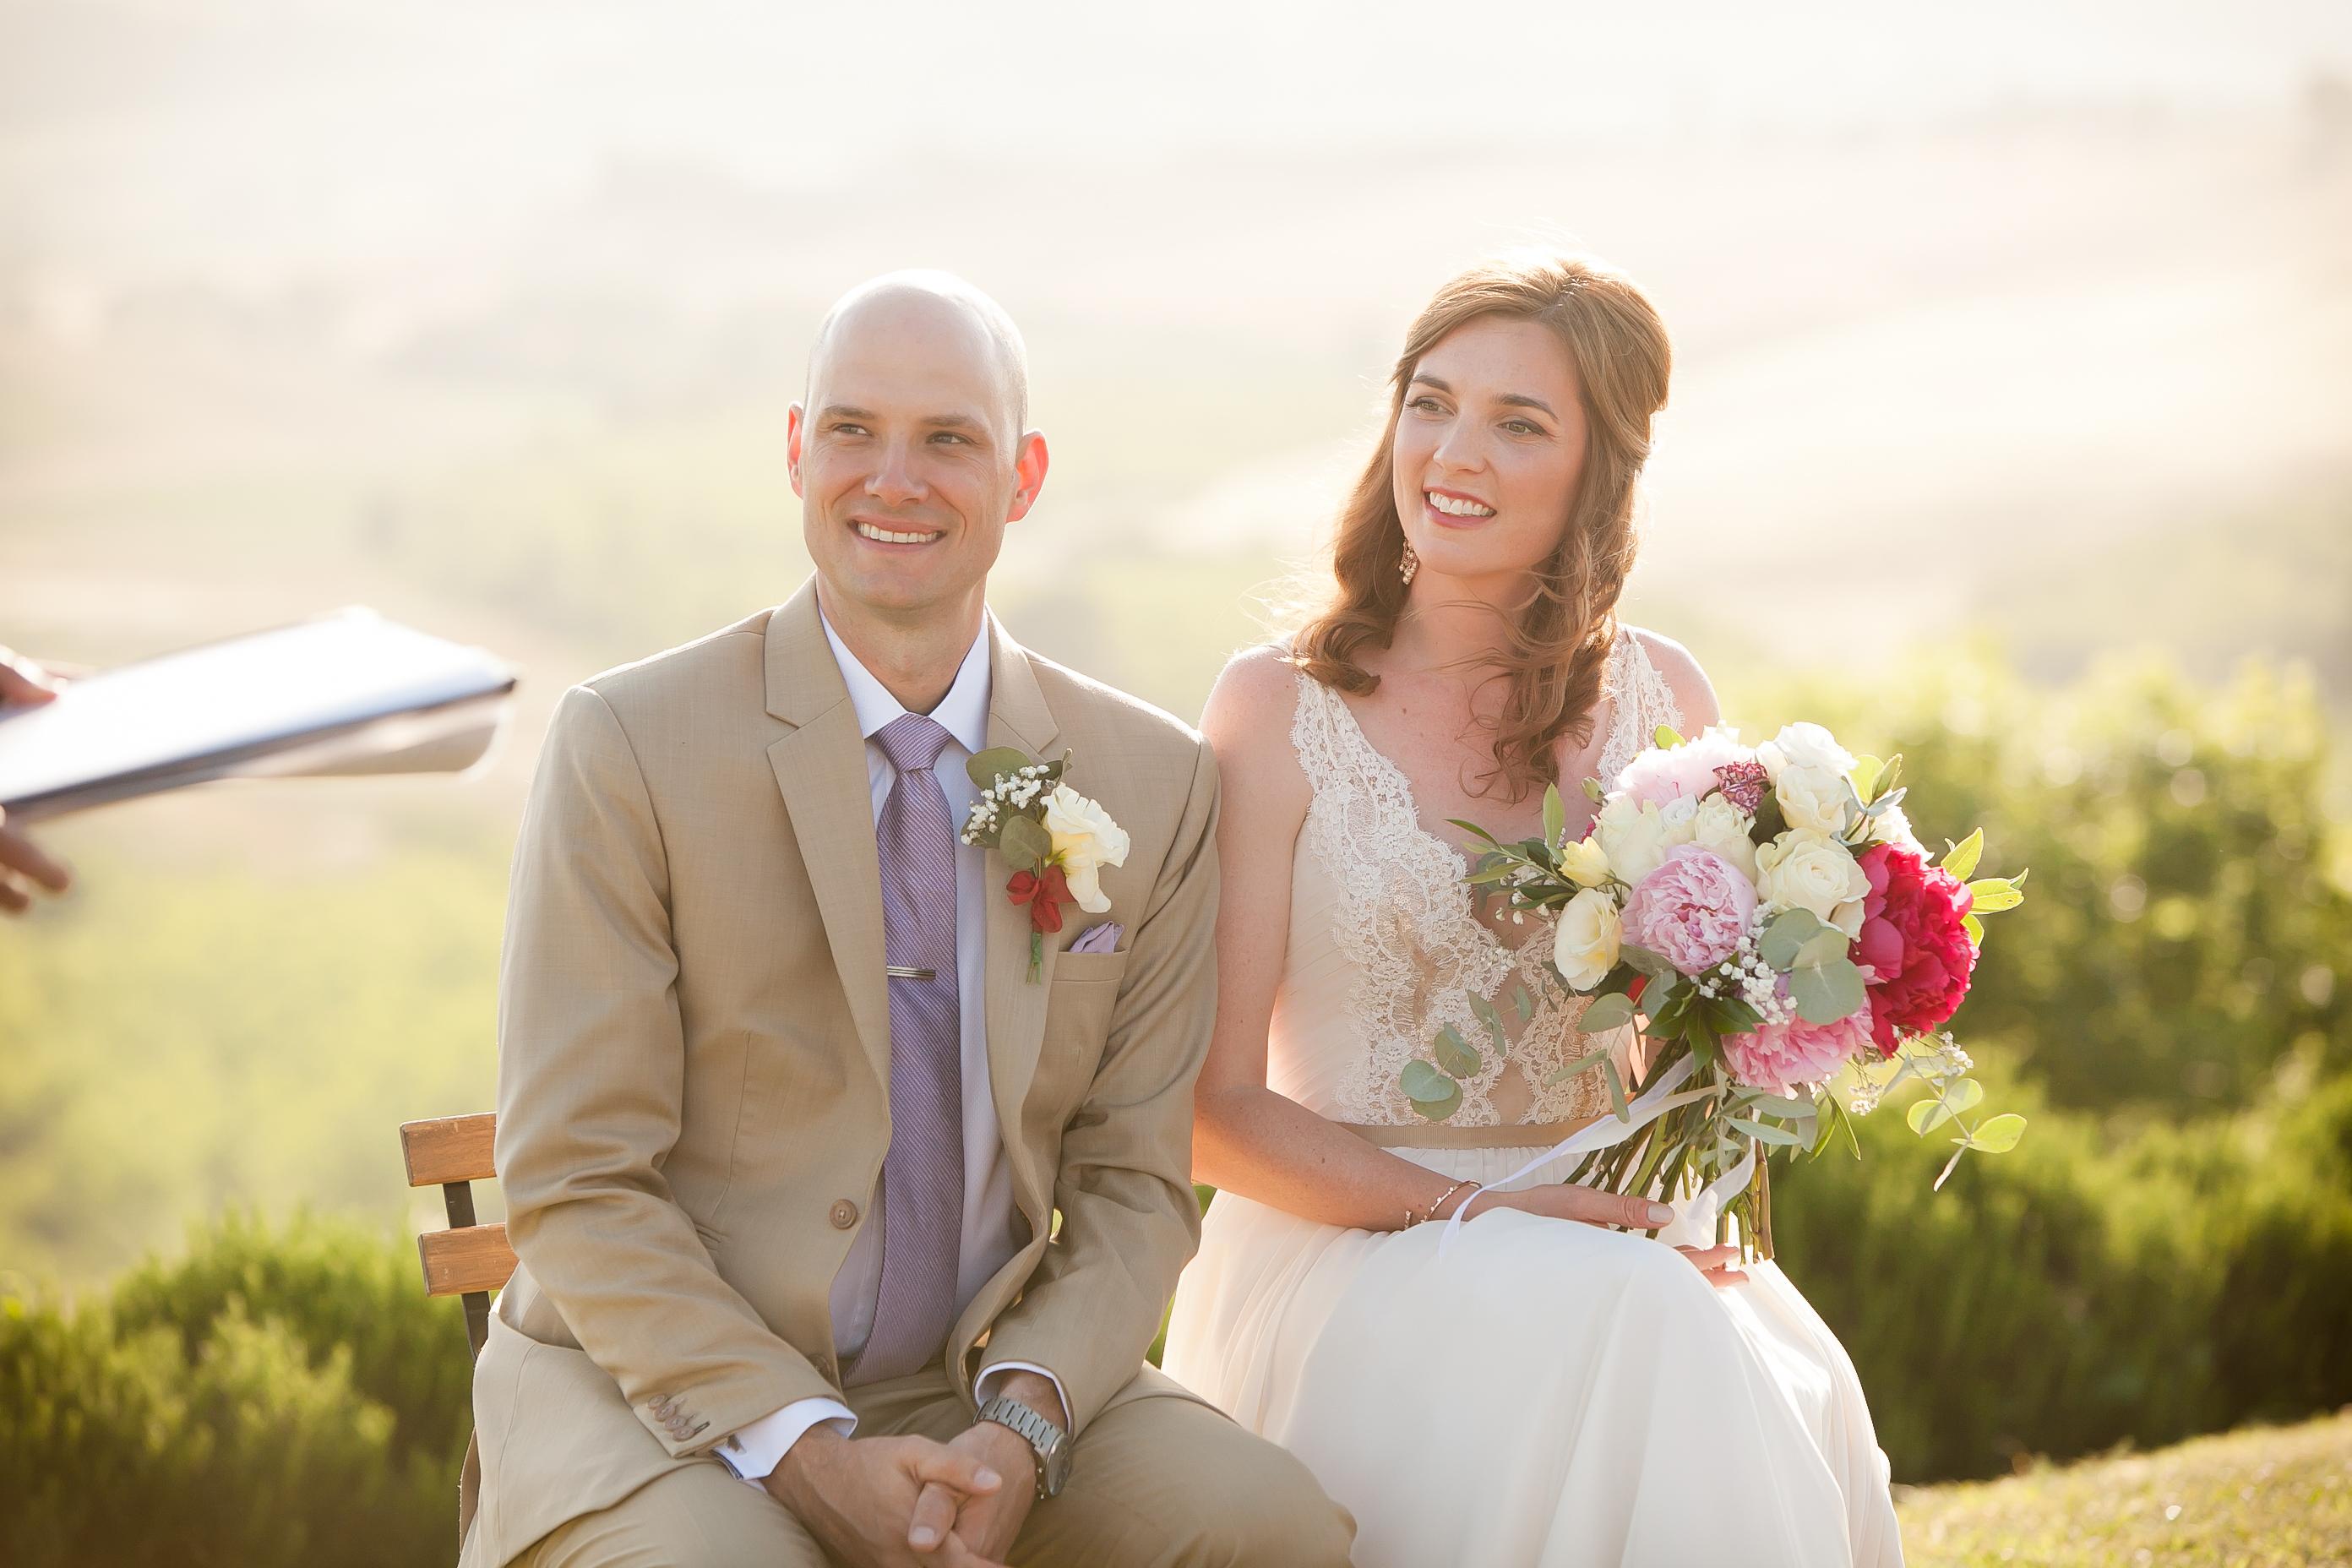 Bride & Groom Photo - Countryside Wedding in Tuscany